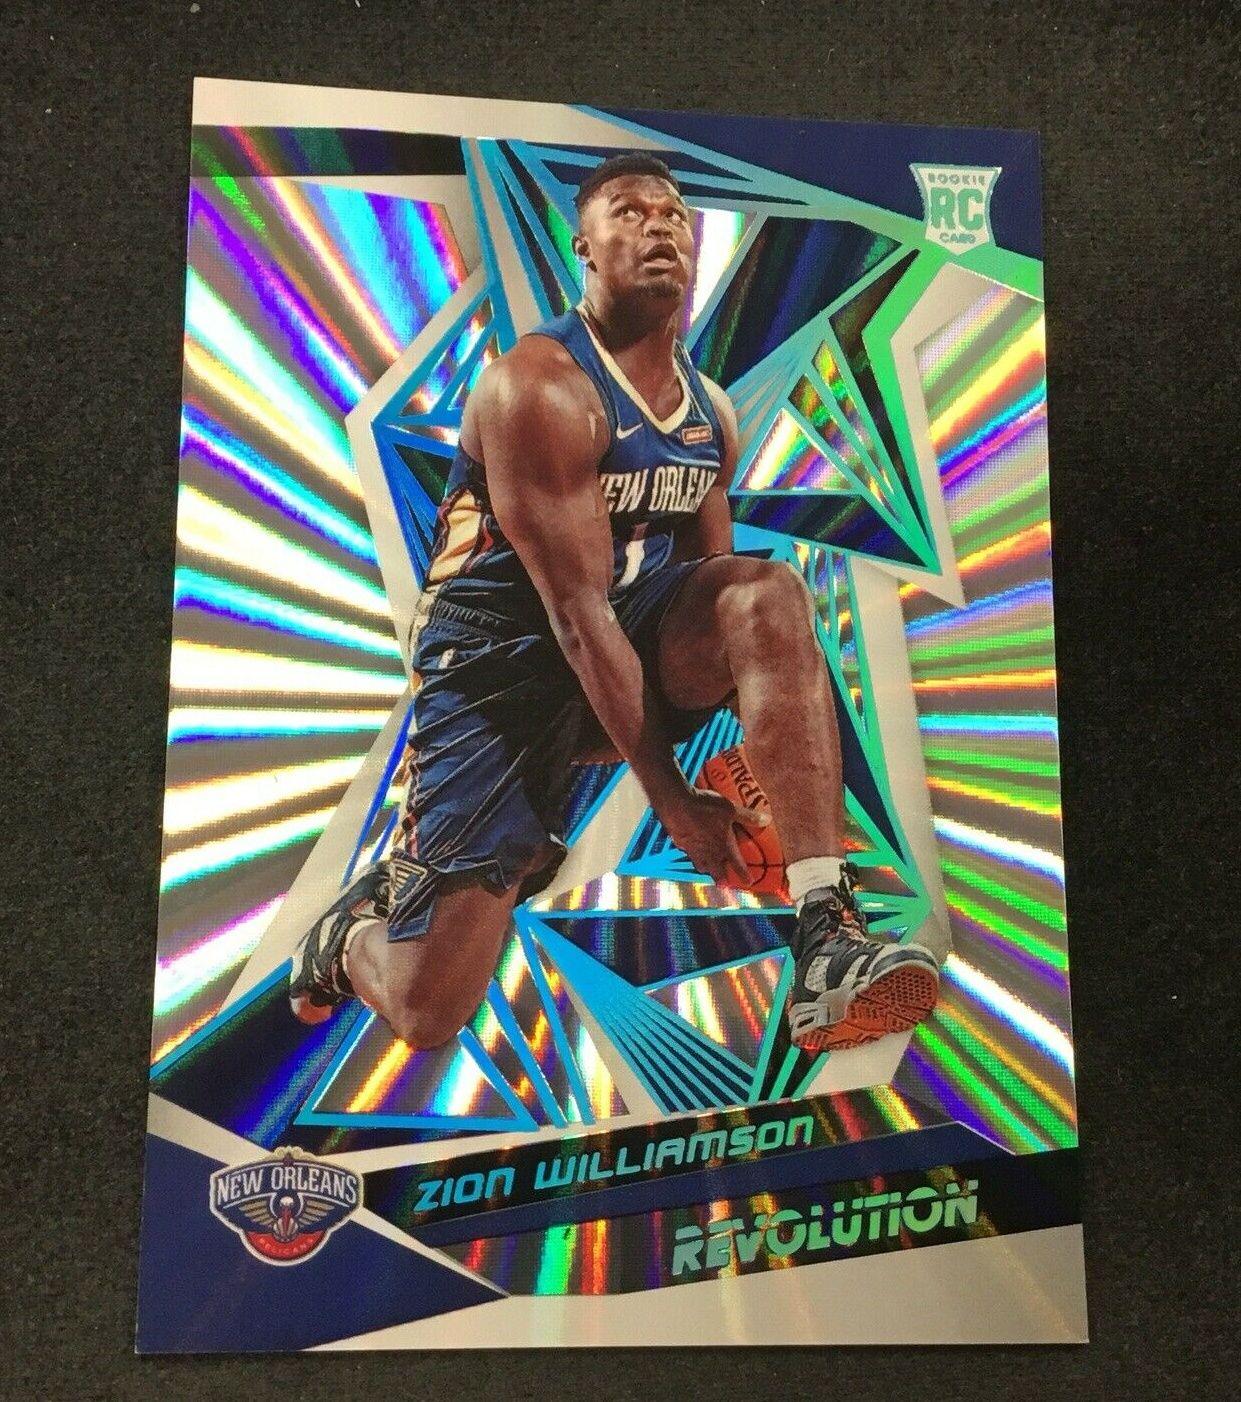 No Zion Williamson 19 20 Revolution Rc Galactics On Ebay Yet Zion Ebay Quick Links Revolution Basketball In 2020 Basketball Cards Basketball Players Painted Books